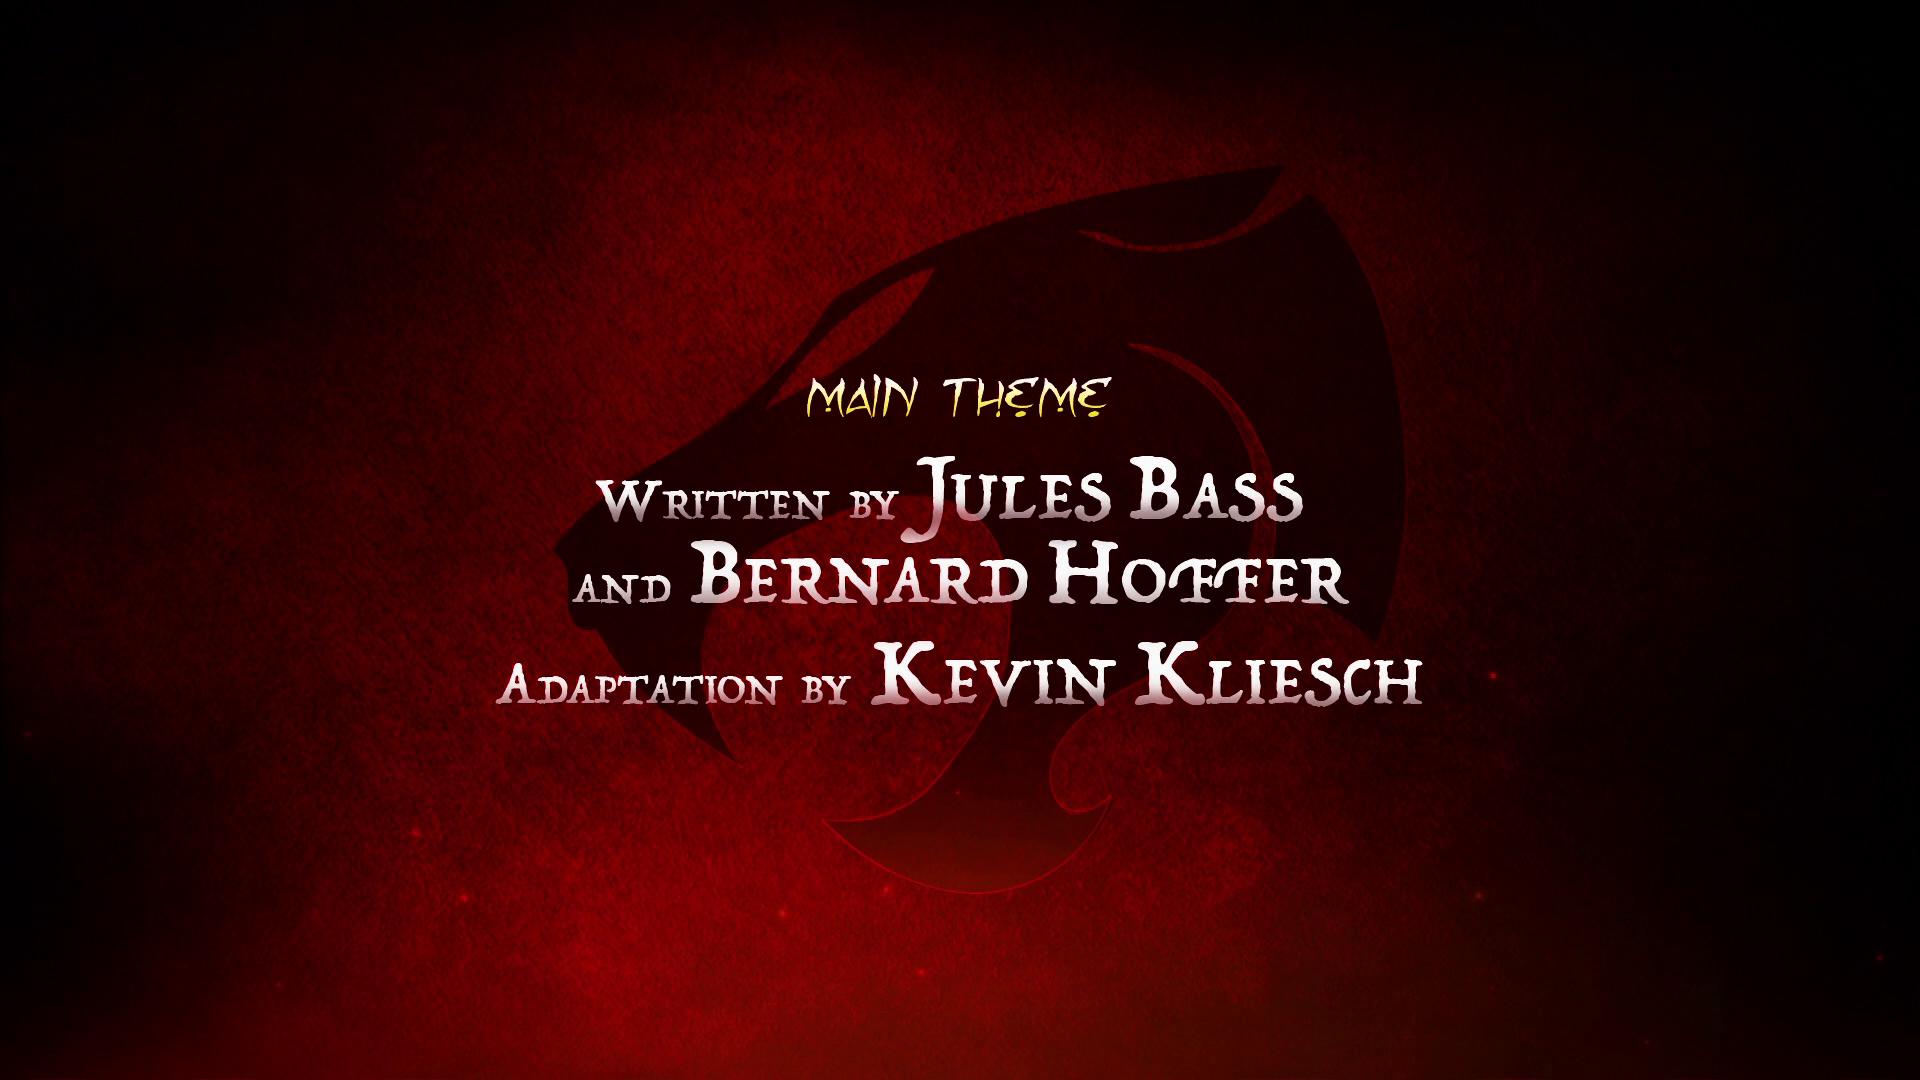 ThunderCats (2011 TV series) Crew Credits